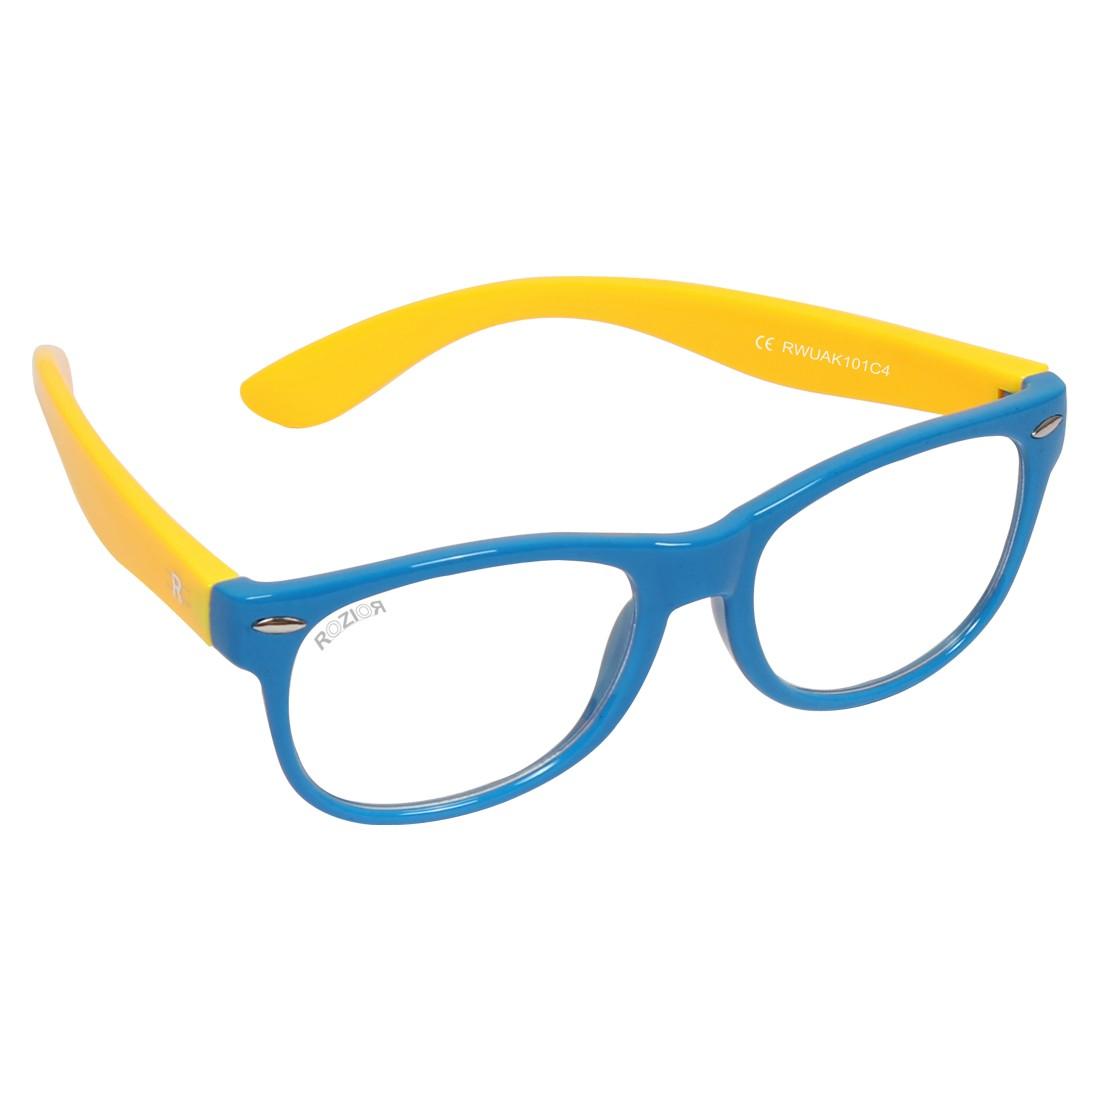 ROZIOR Italy Anti-Glare Blue Light Eye Protection Computer/Mobile Screen Eye Glasses for kids | Zero Power Computer Light Protection | Best For Online Classes | Model: RSHUK12667C1